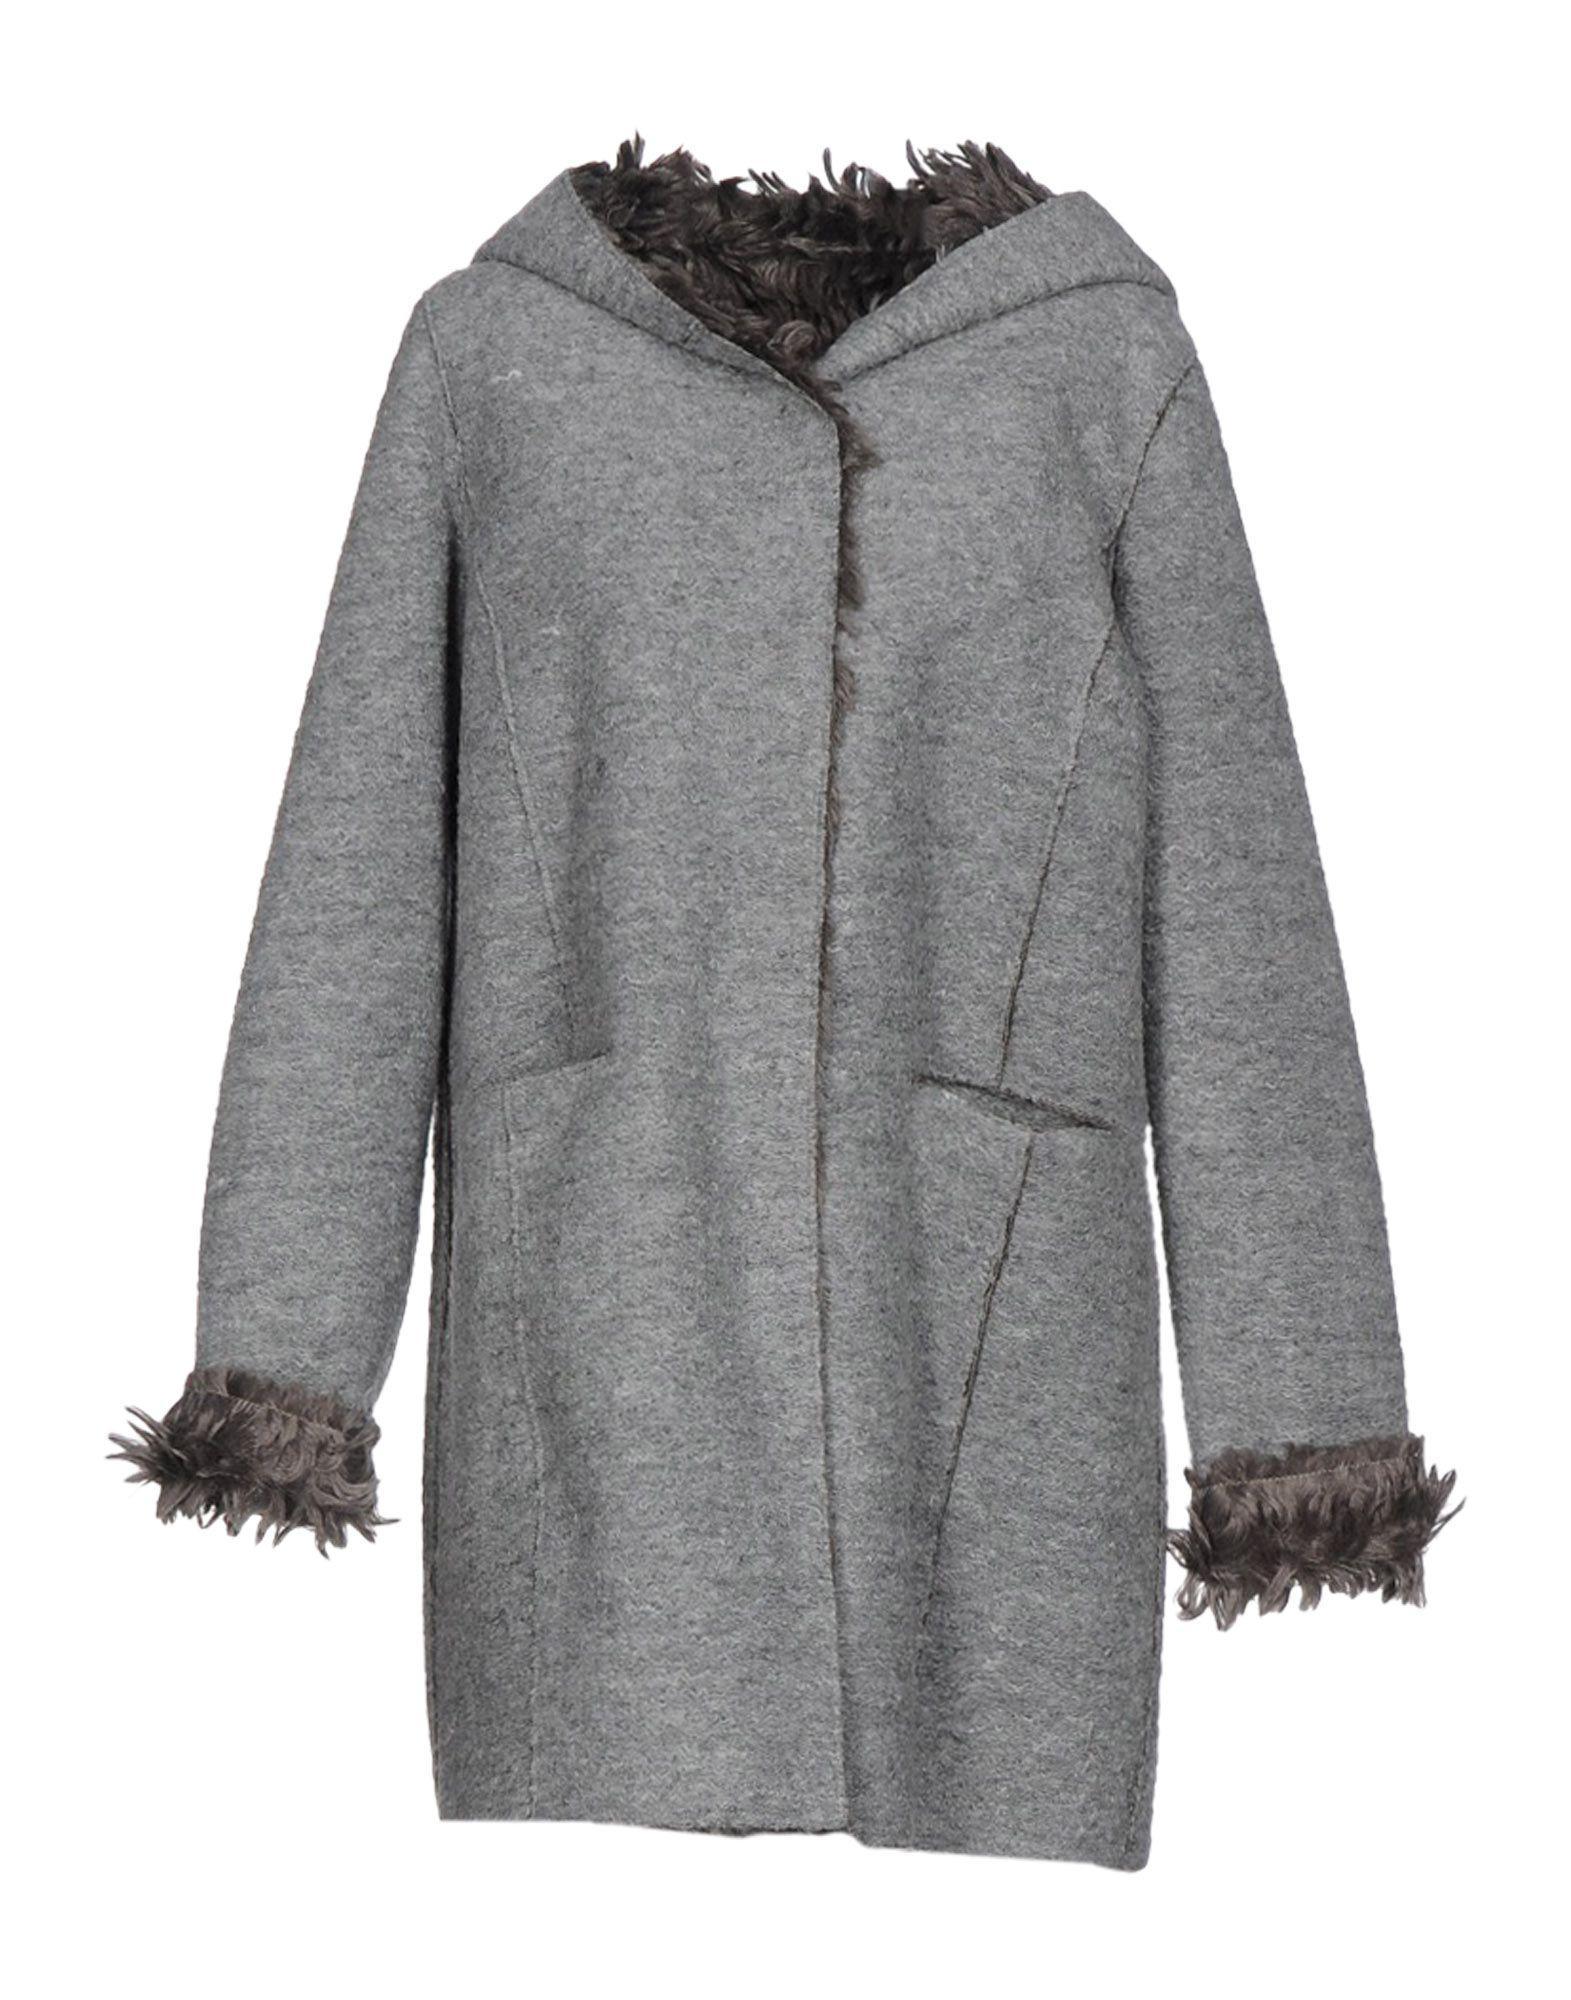 Bosideng Coat In Grey